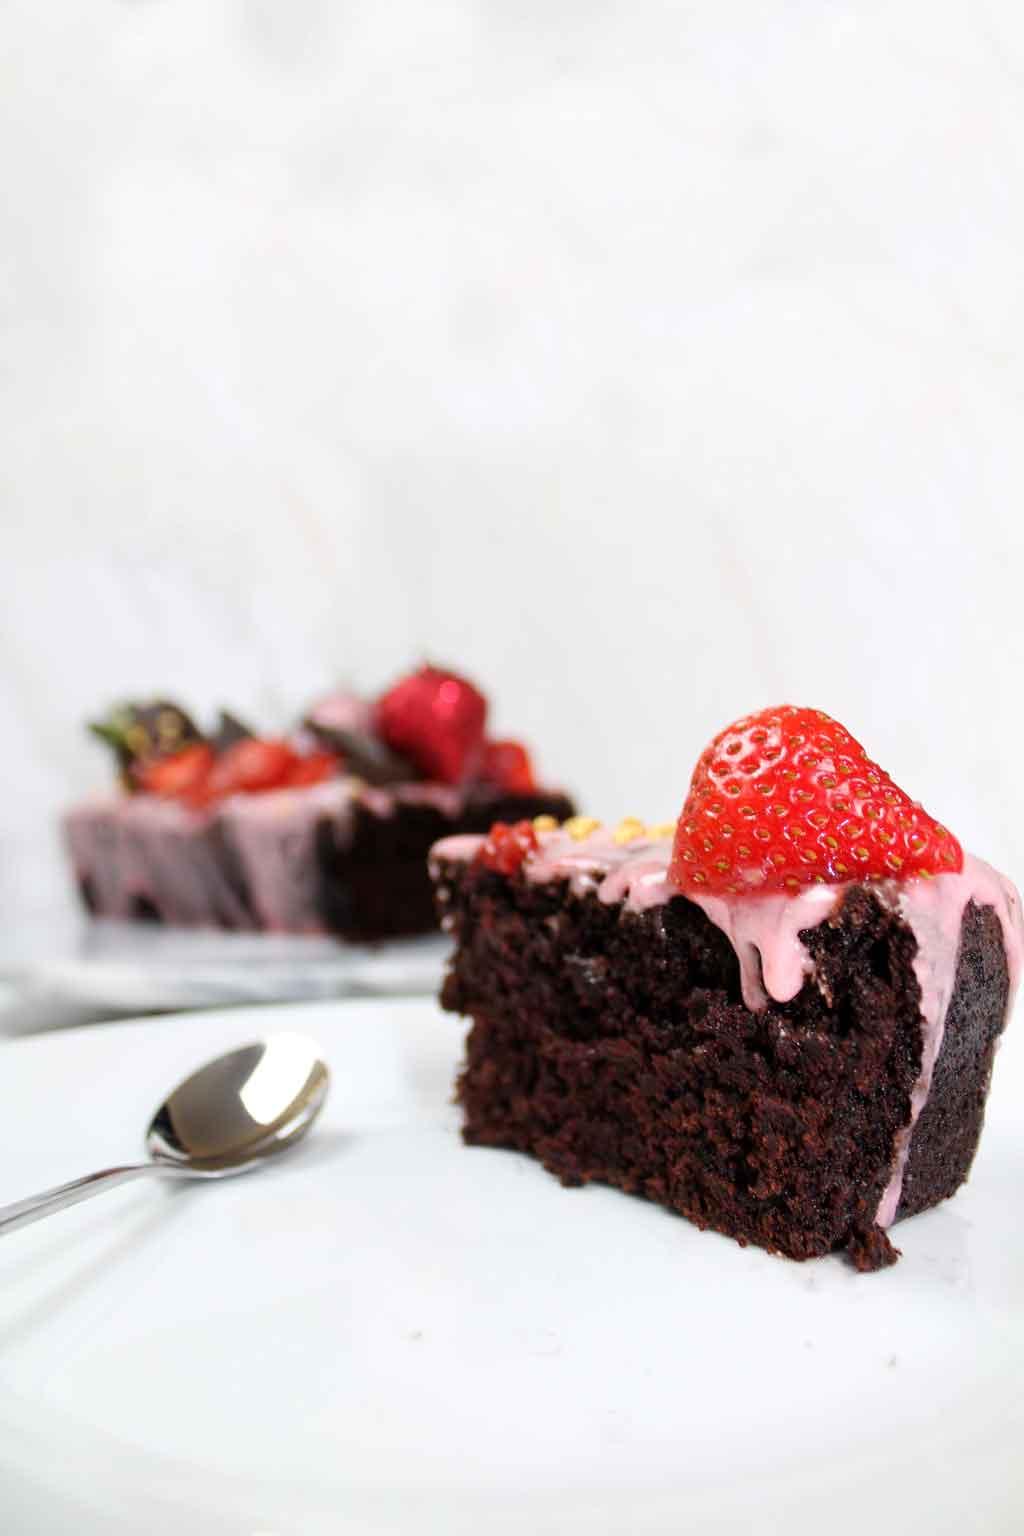 Vegan chocolate strawberry cake